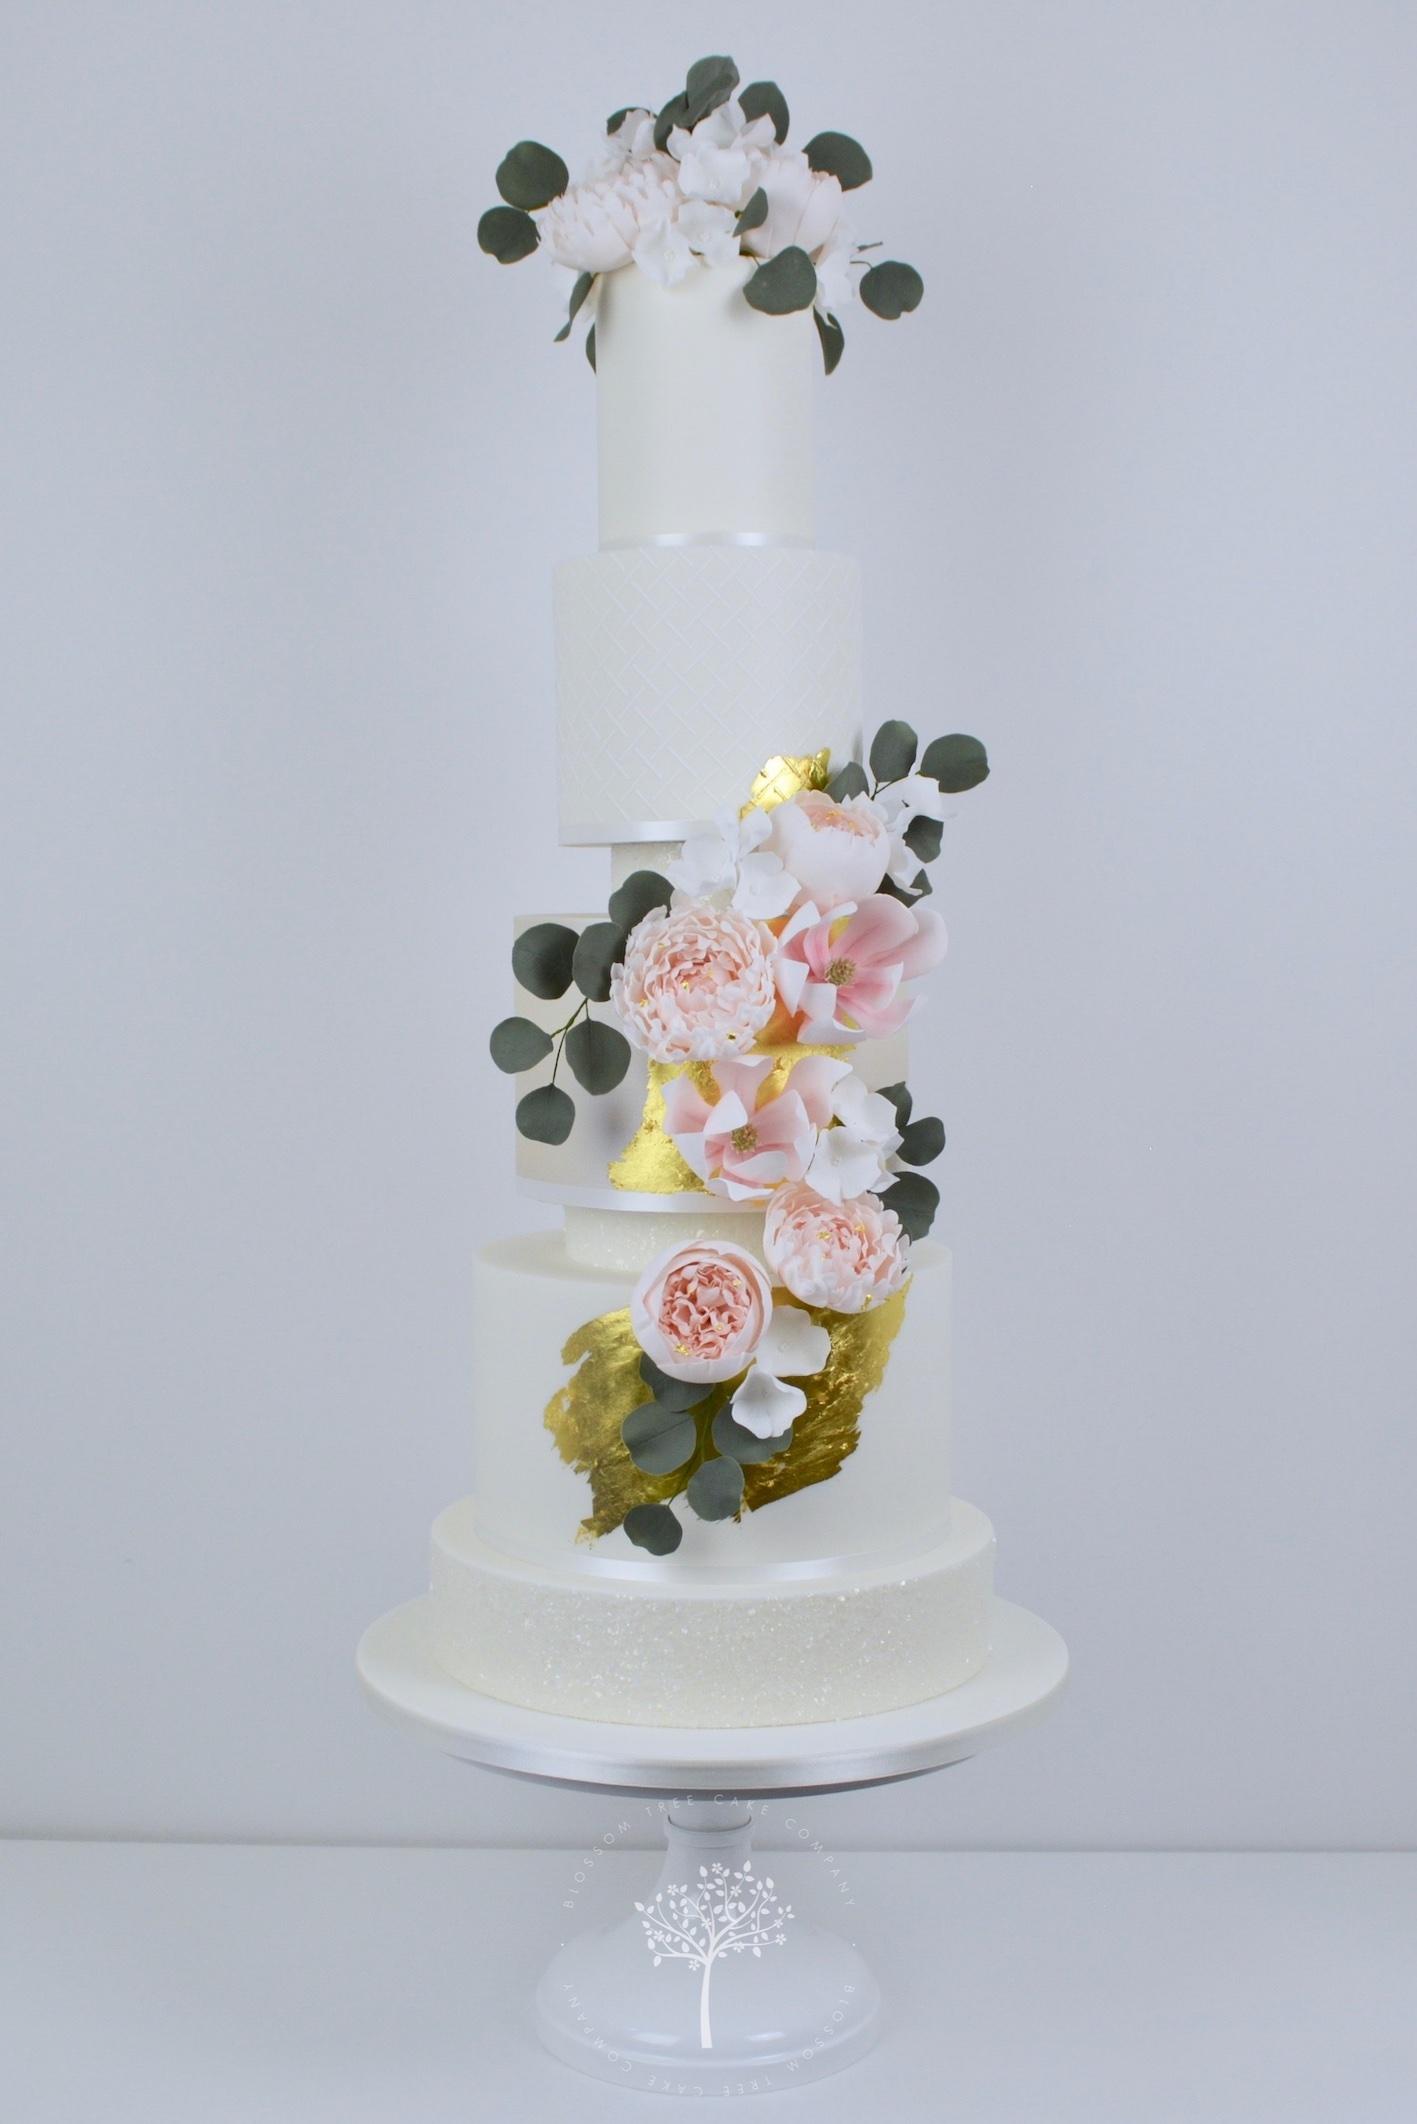 Peony and Magnolia Wedding Cake by Blossom Tree Cake Company Harrogate North Yorkshire - website.jpg